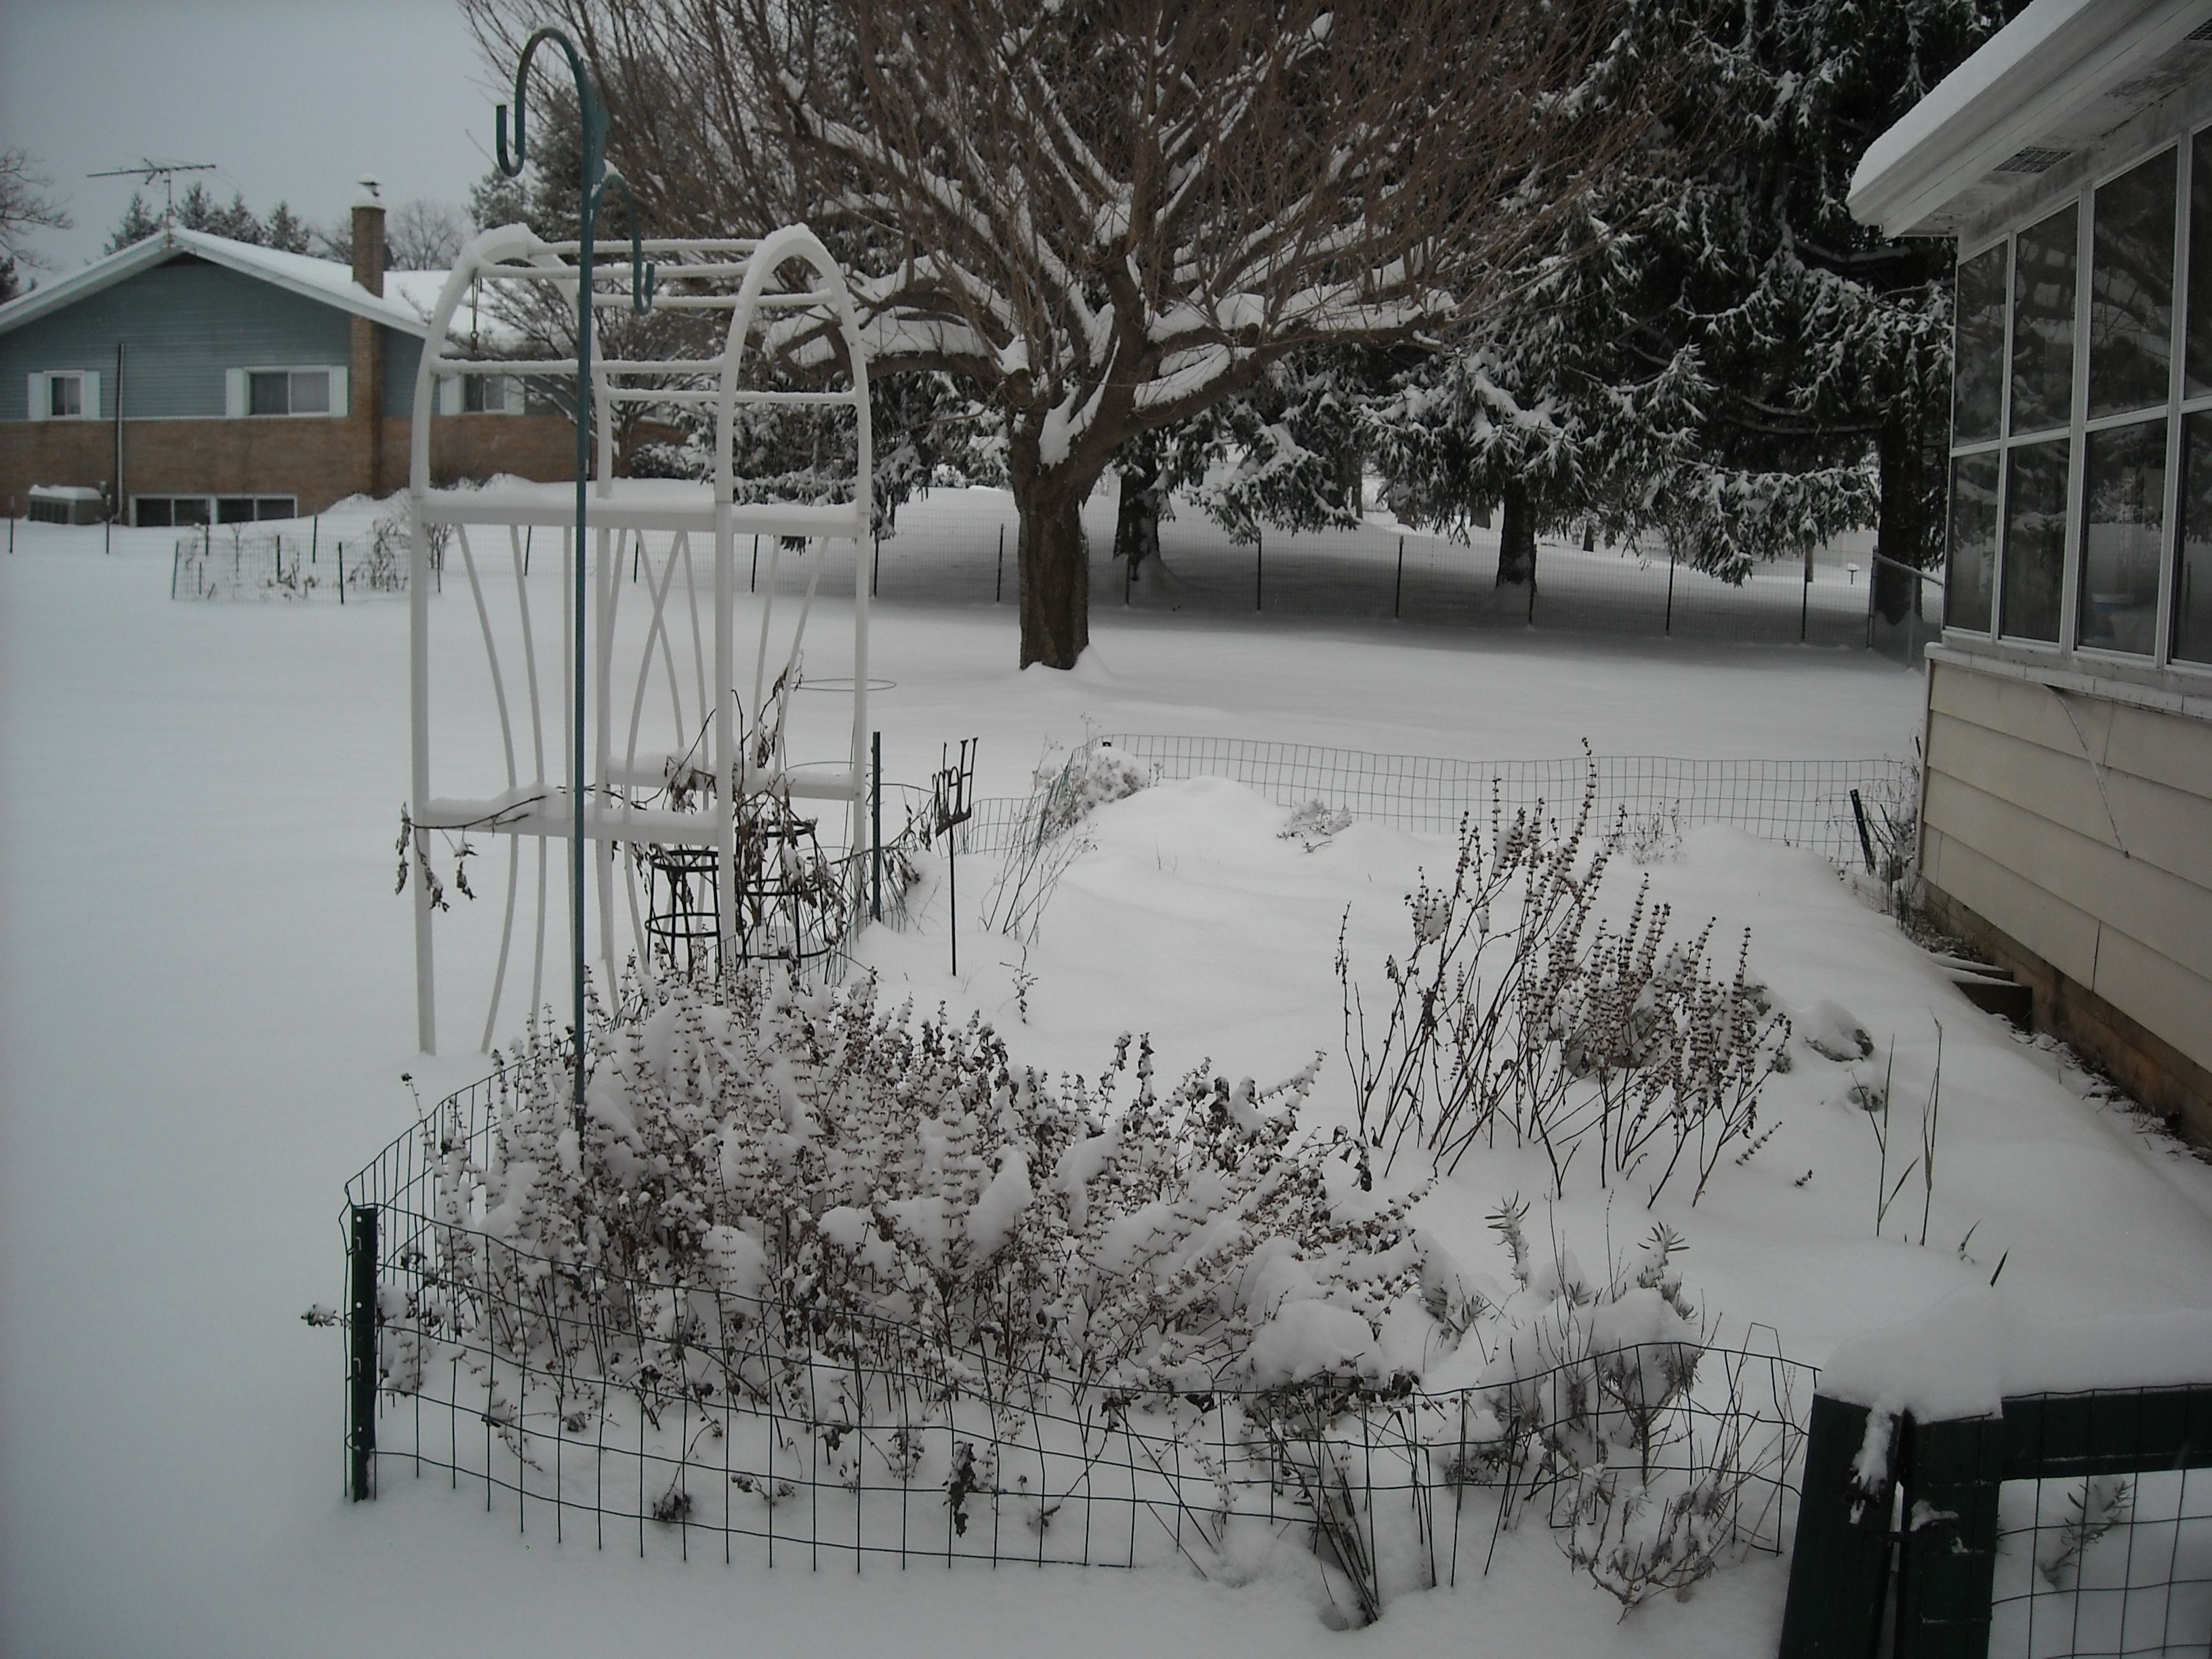 my herb garden snow fall 12 08 2013 winter in manchester